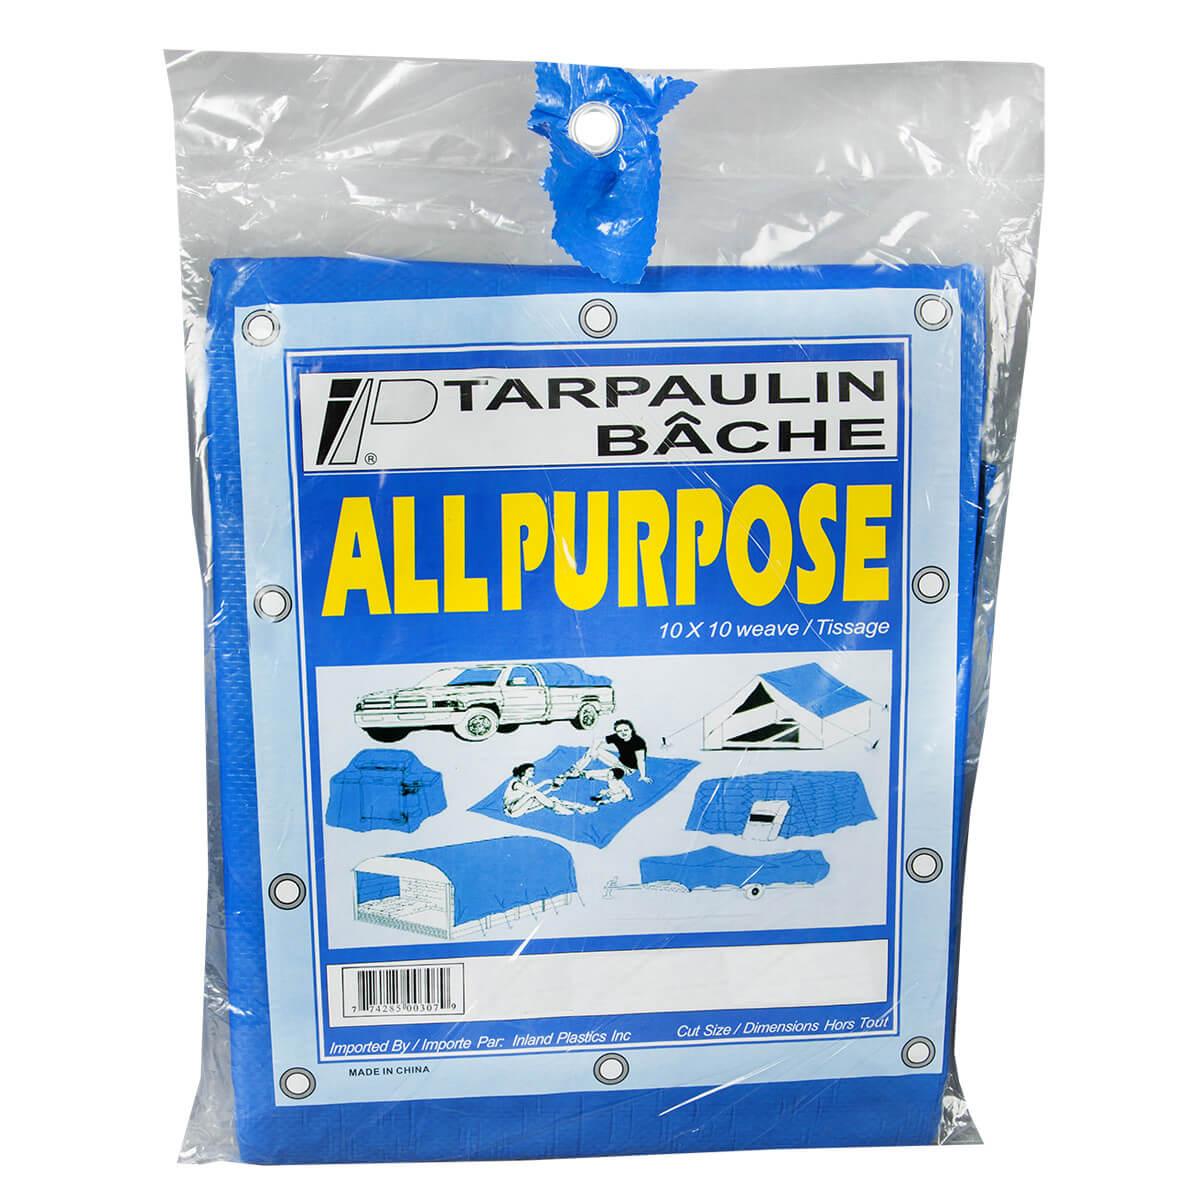 All Purpose Blue Utility Tarps - 6' x 8'